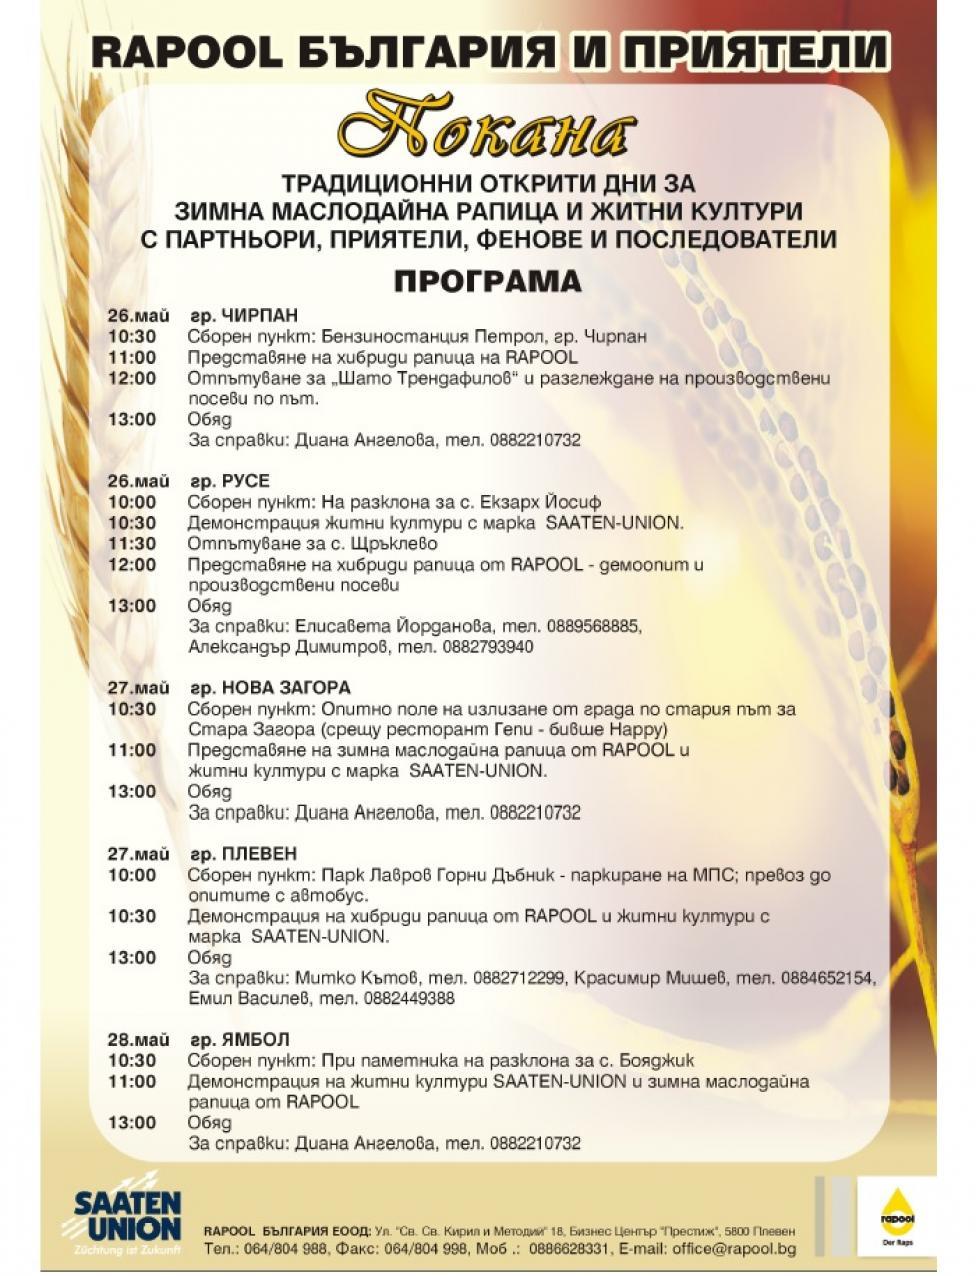 Открити дни на Rapool България